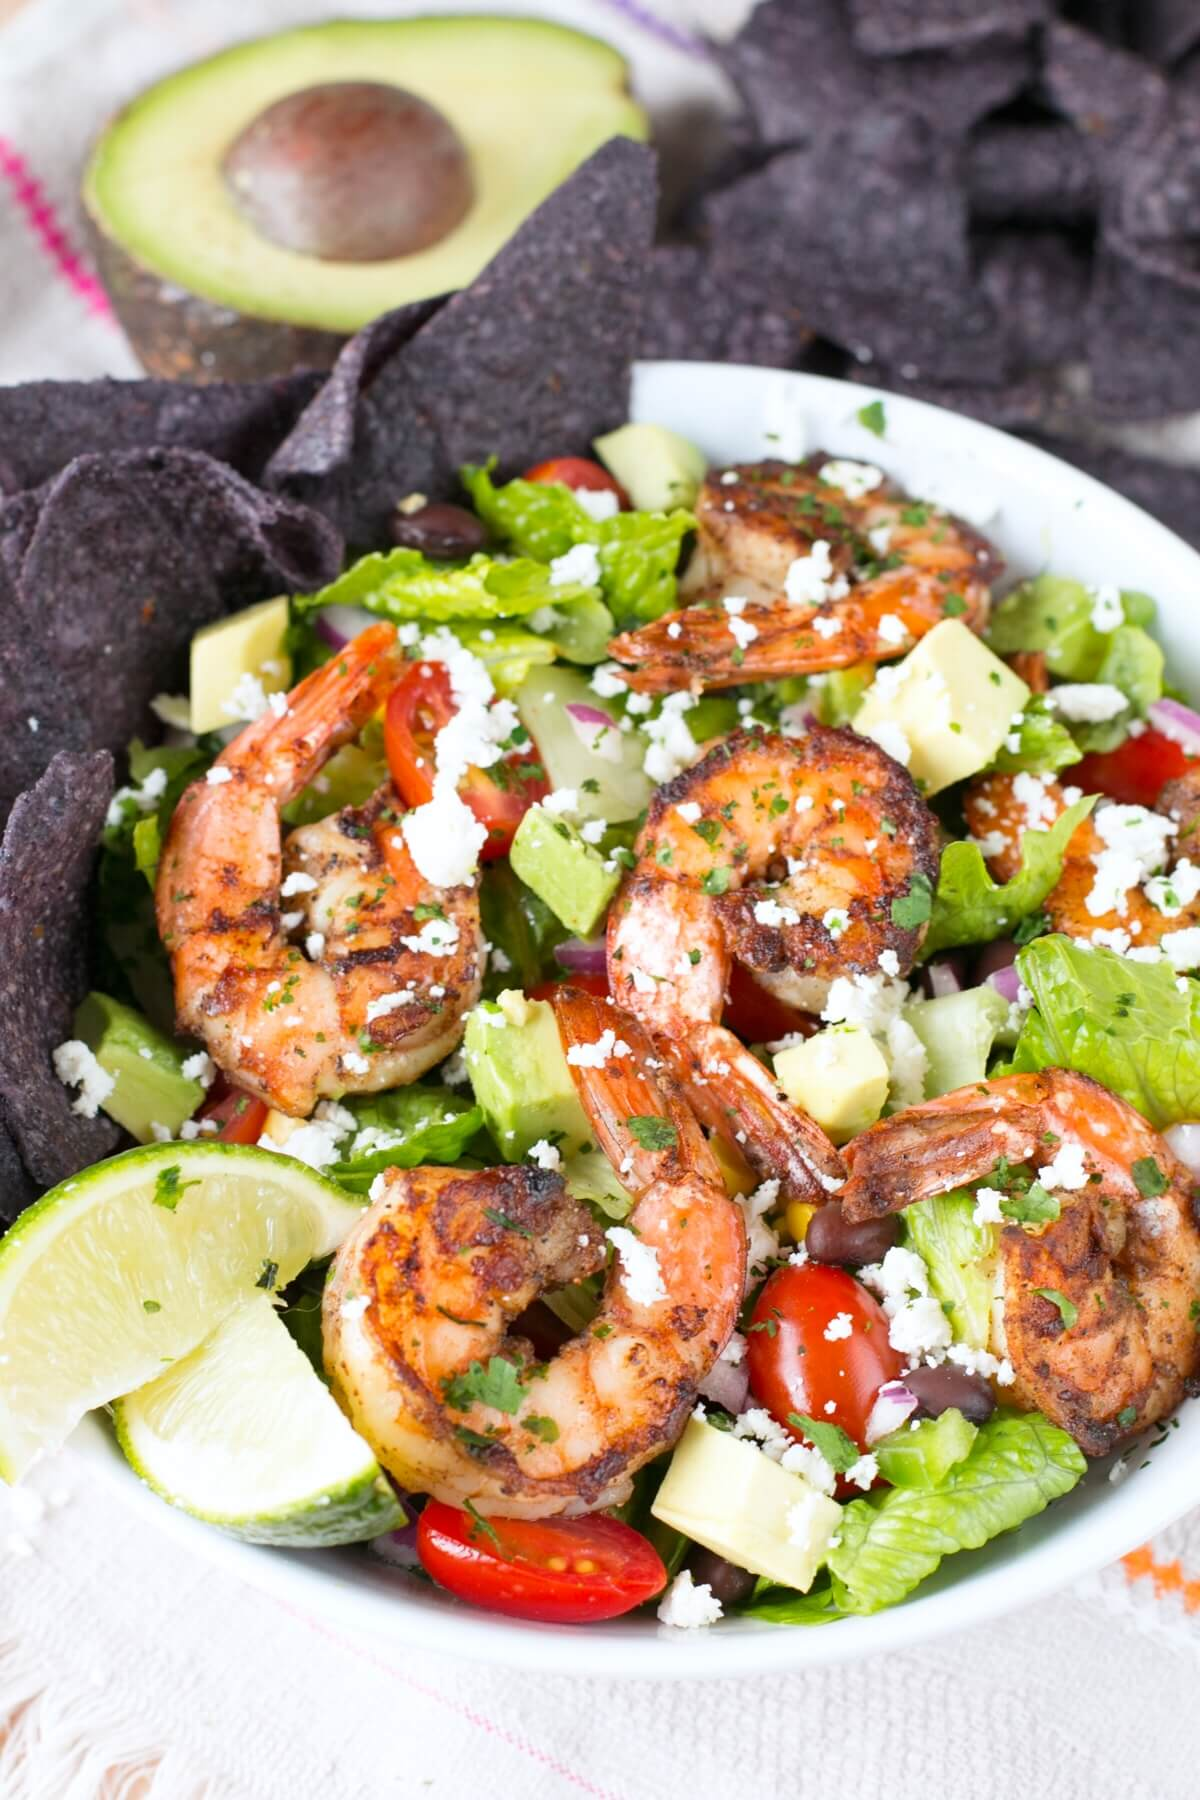 How To Make A Mexican Shrimp Healthy Taco Salad